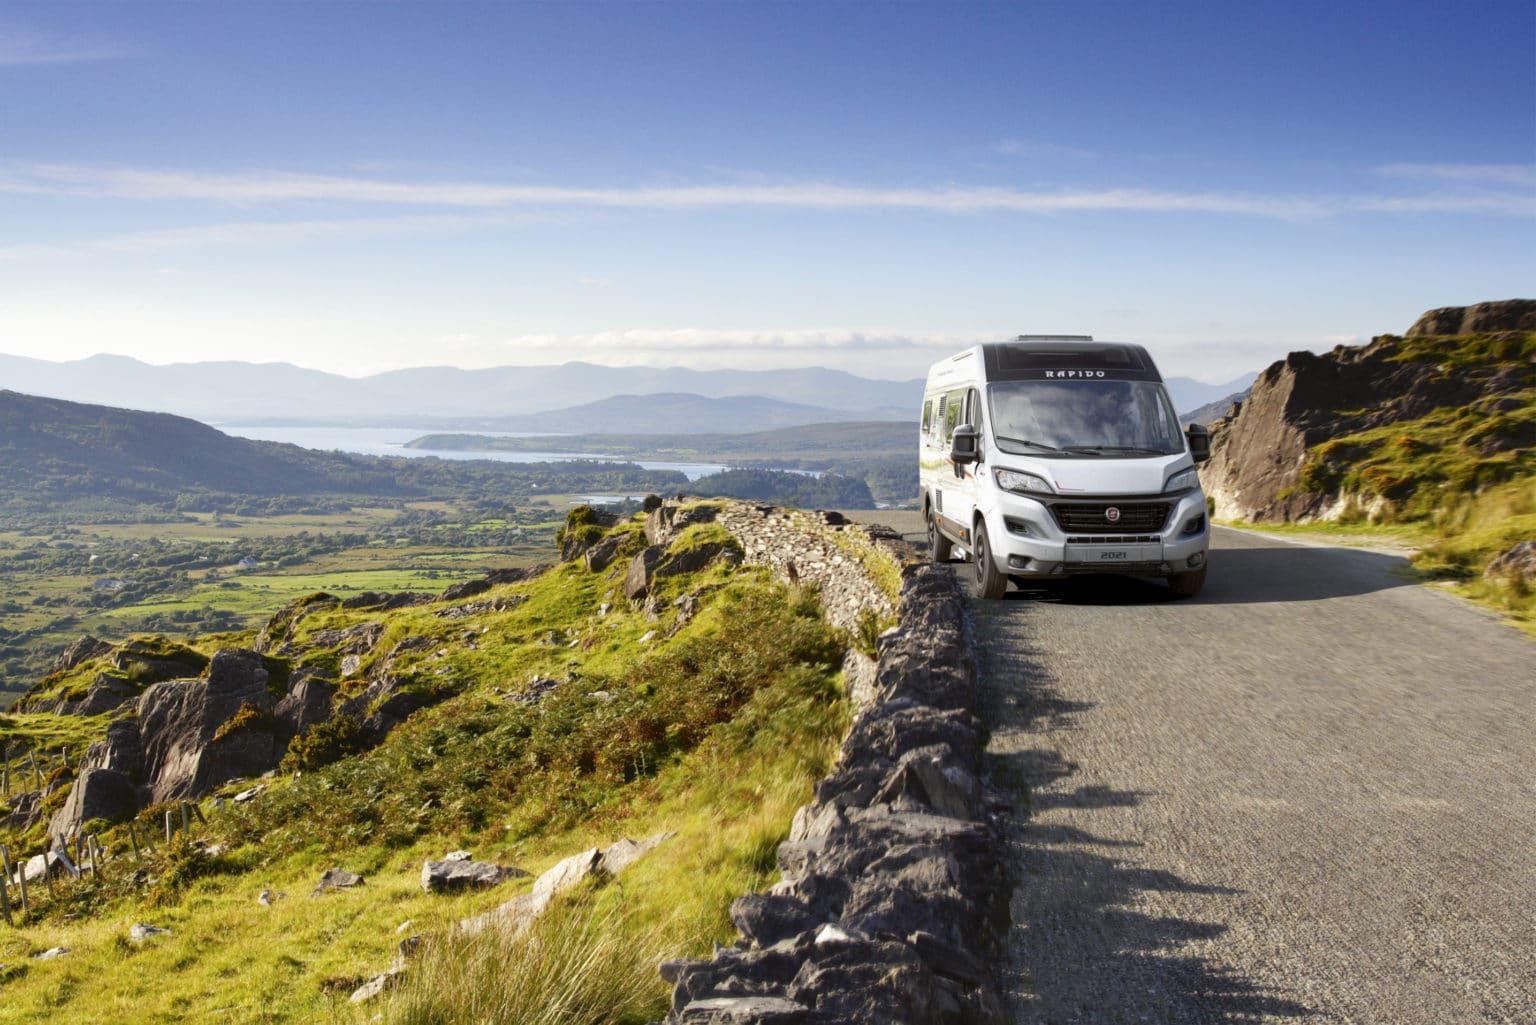 Camping-car centre france rapido